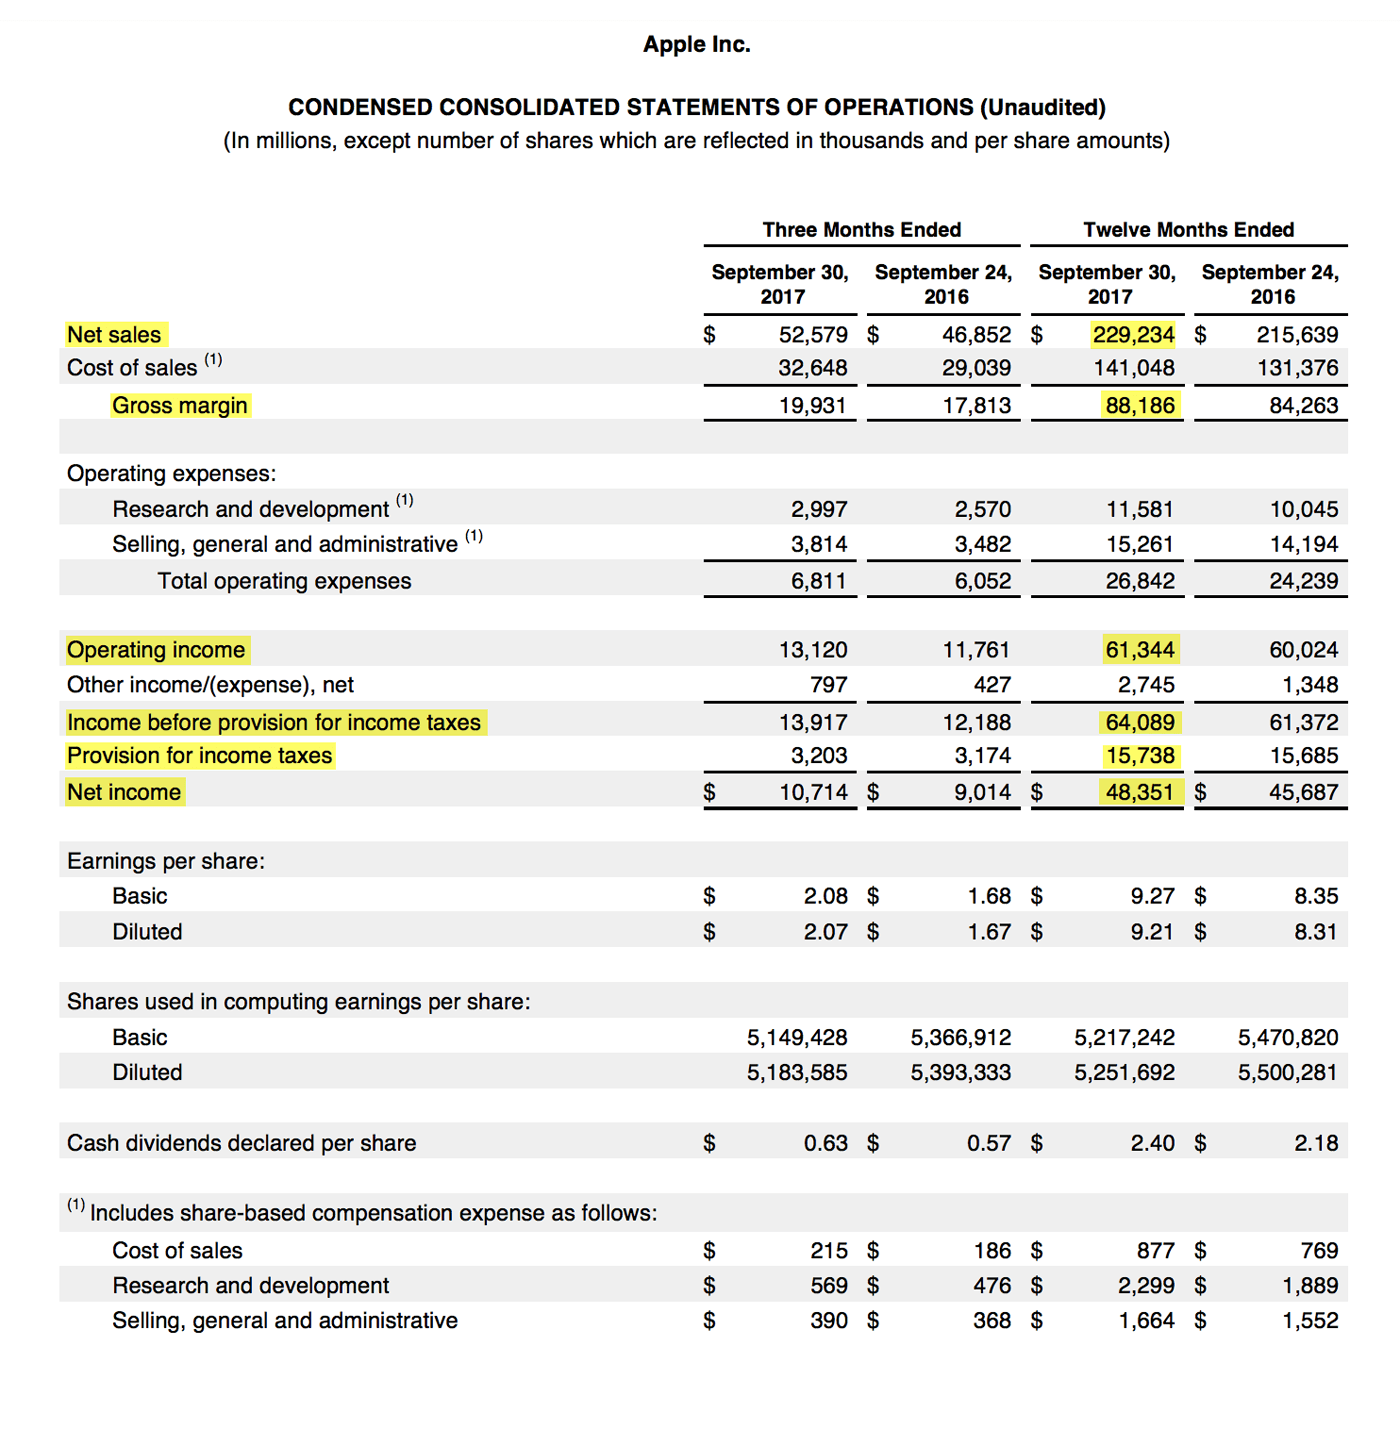 Страница 1 отчета «Эпла» за 2017 финансовый год